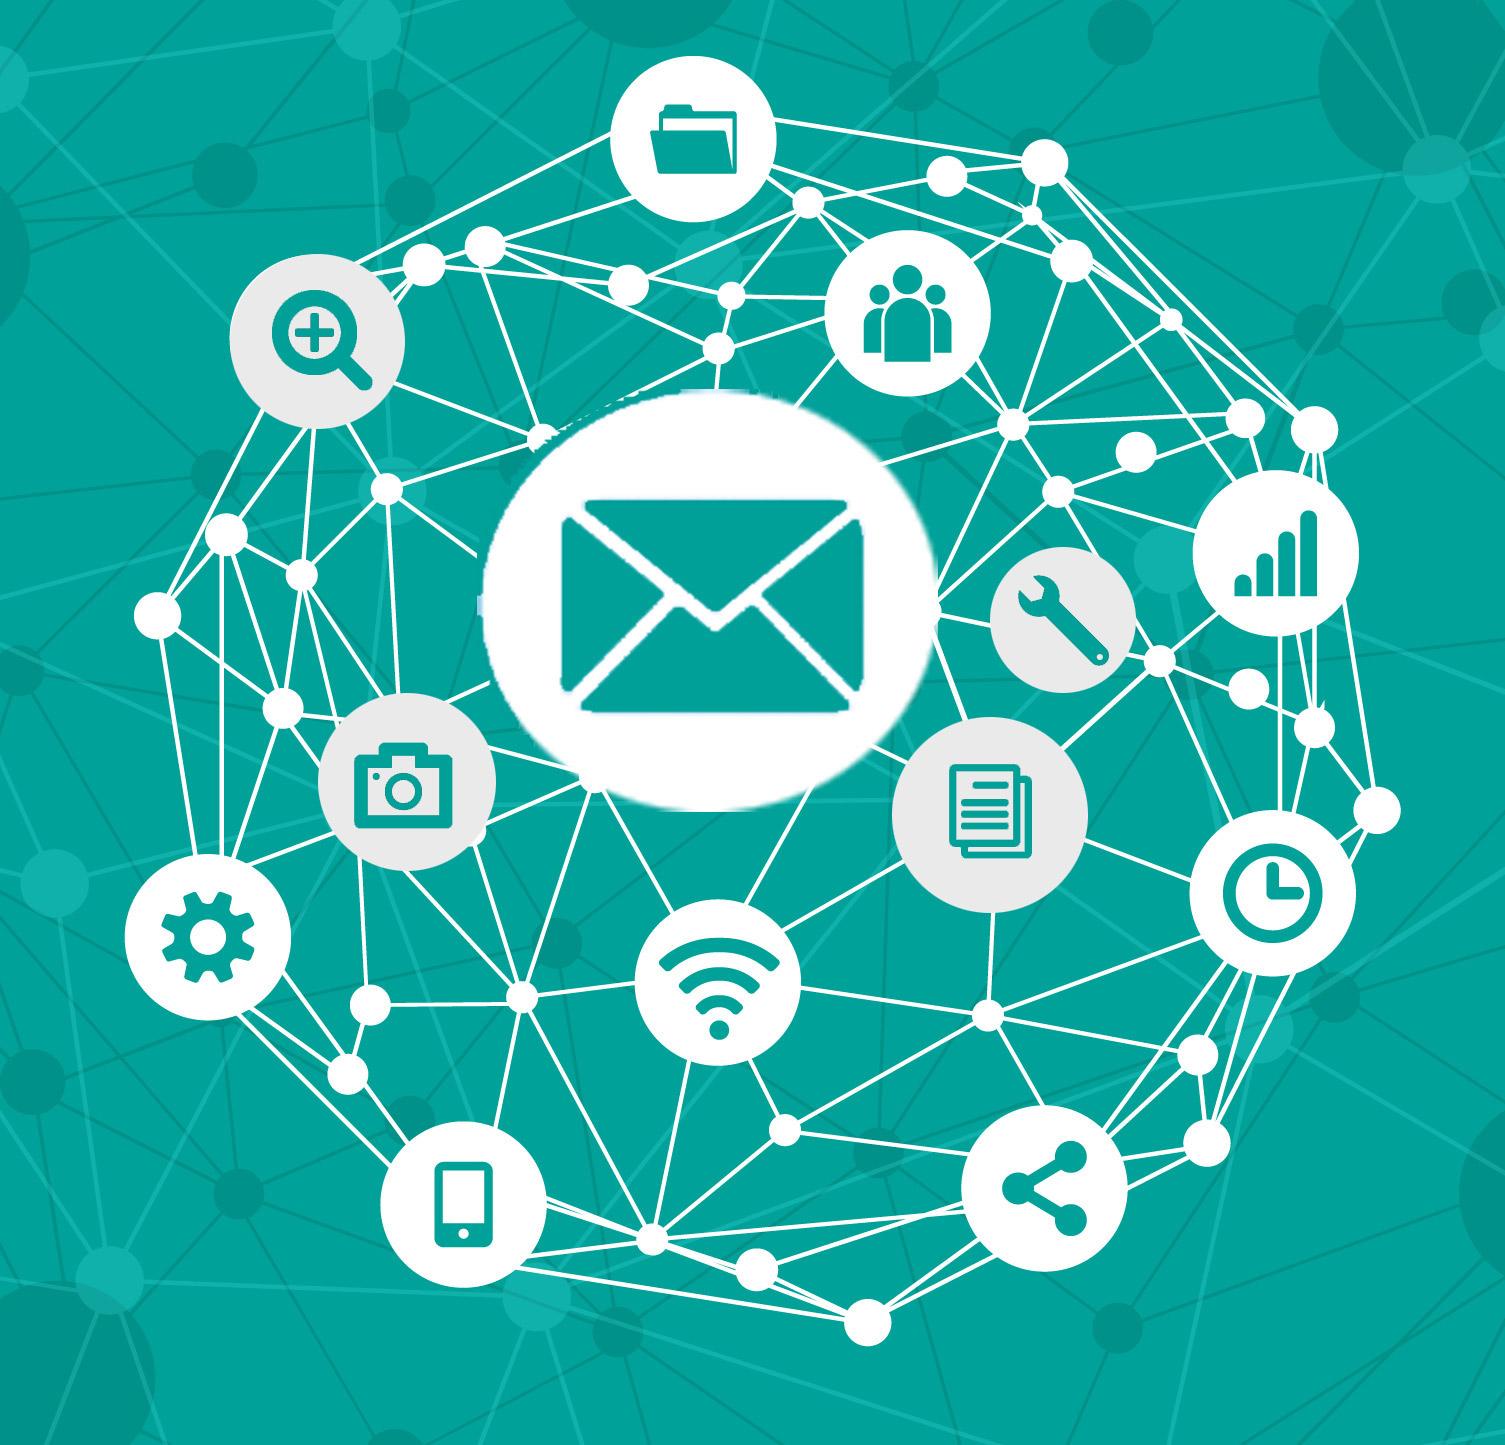 herramientas complementarias para email marketing